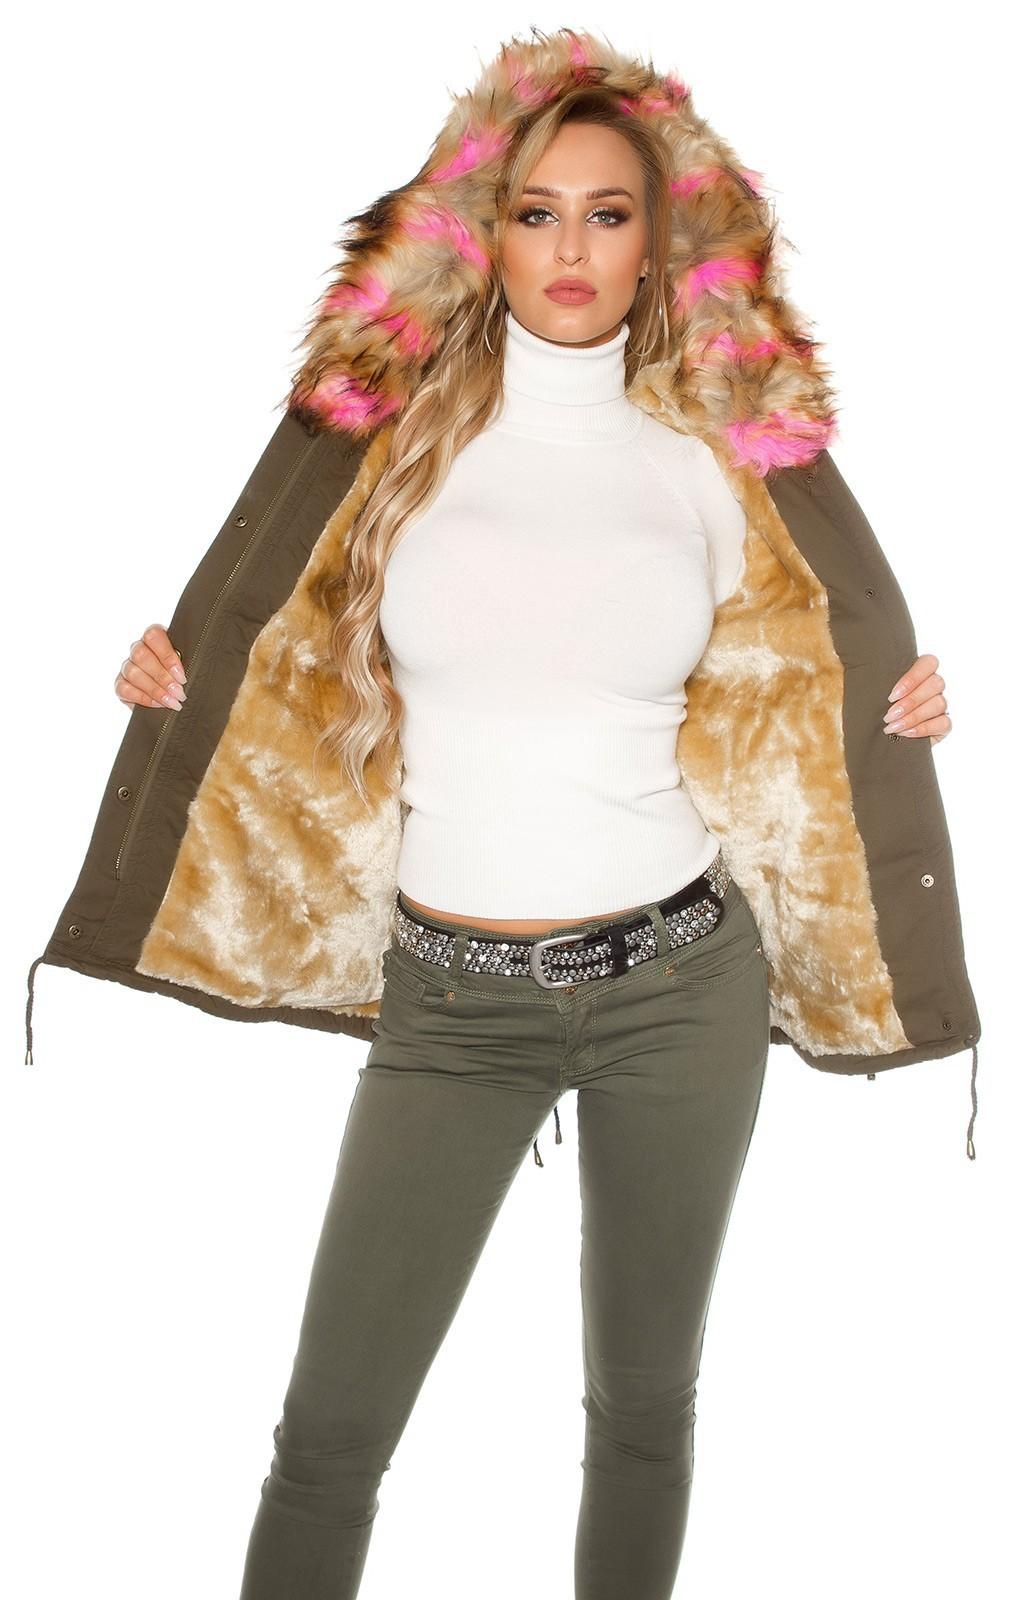 Zimná bunda s hustou kožušinou. 65.00 €. Výber možnostíQuick View be914c1ae3a